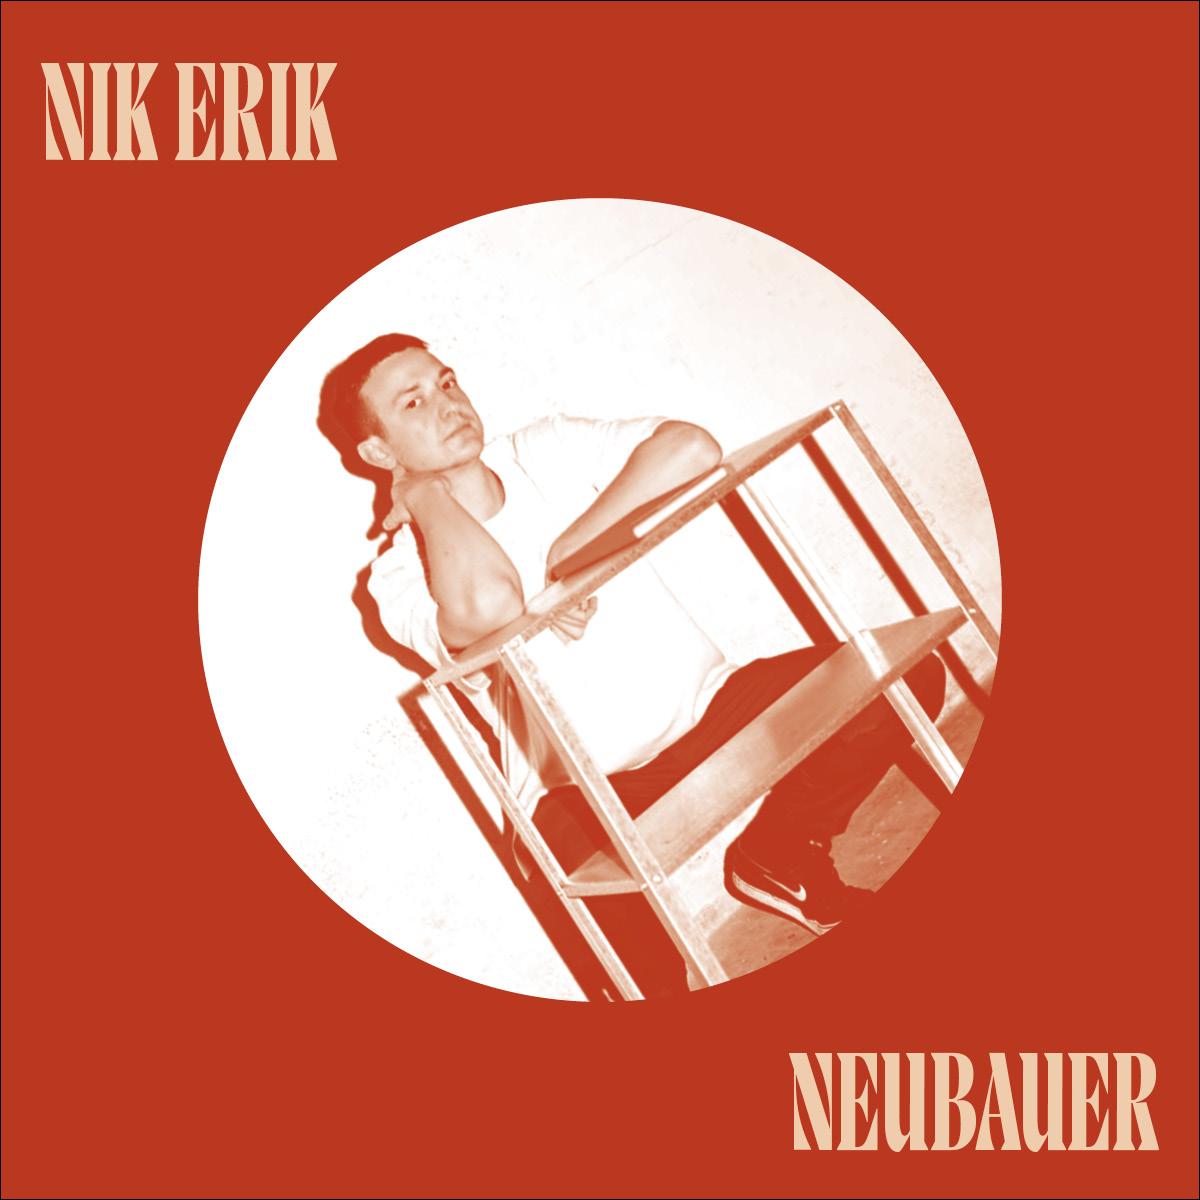 Slika Nik Erik Neubauer